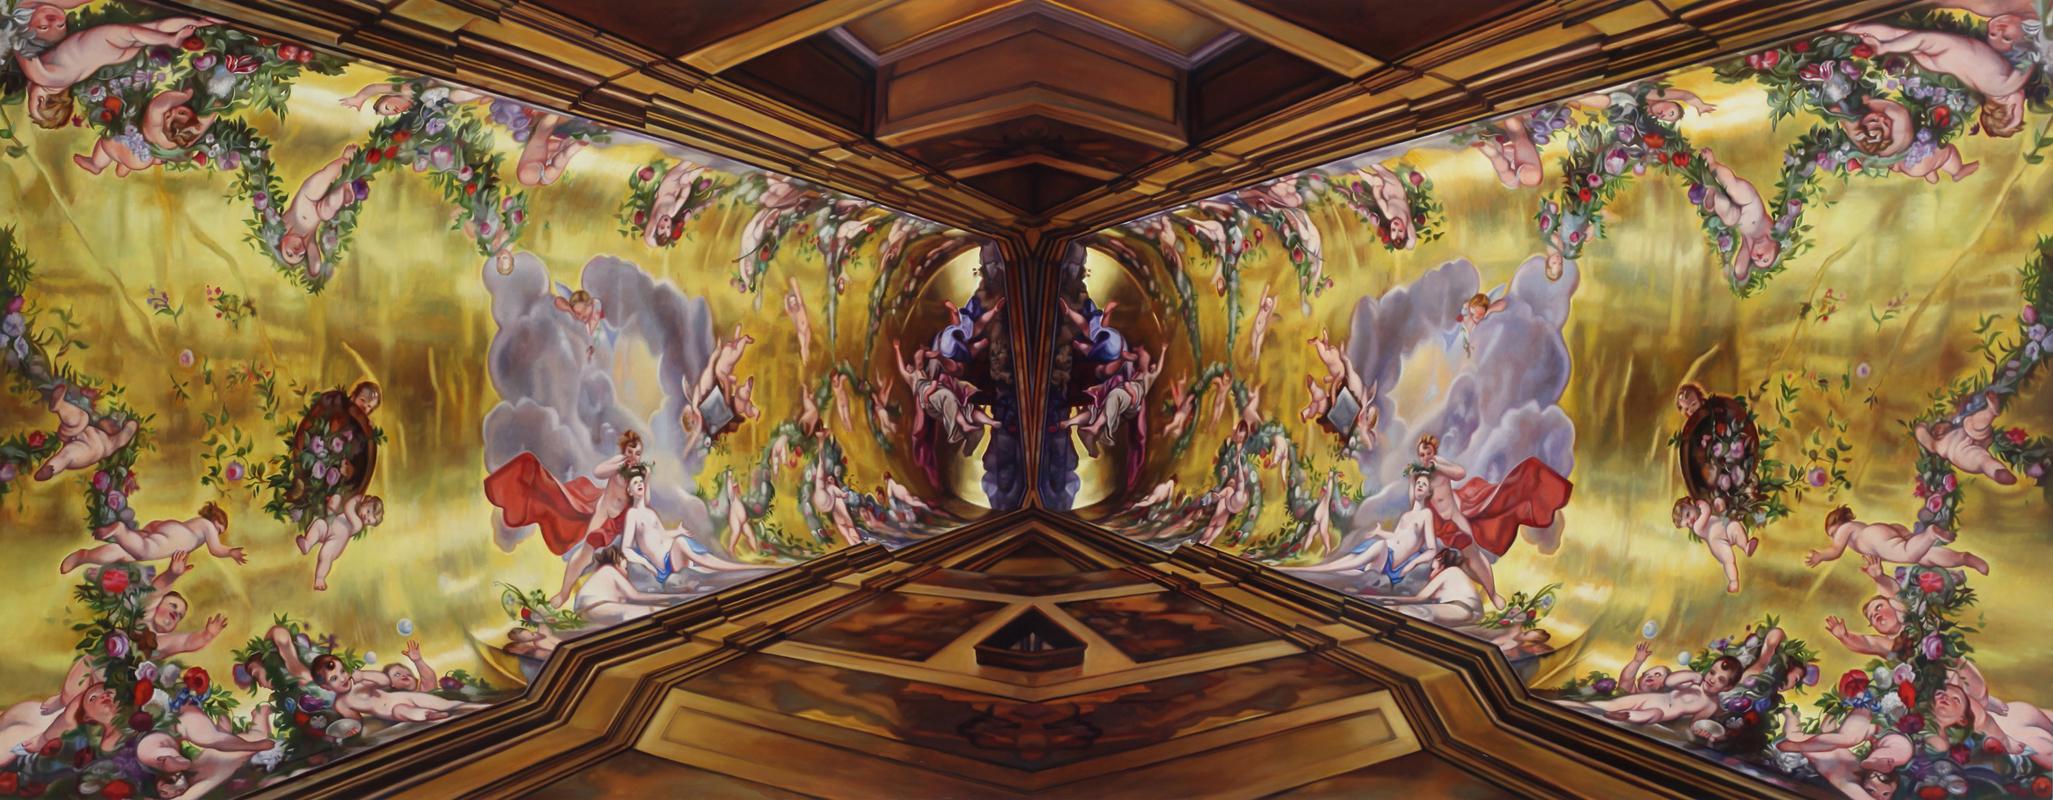 "Holy Bravado    Oil on linen over panel  36"" x 92""  2013"